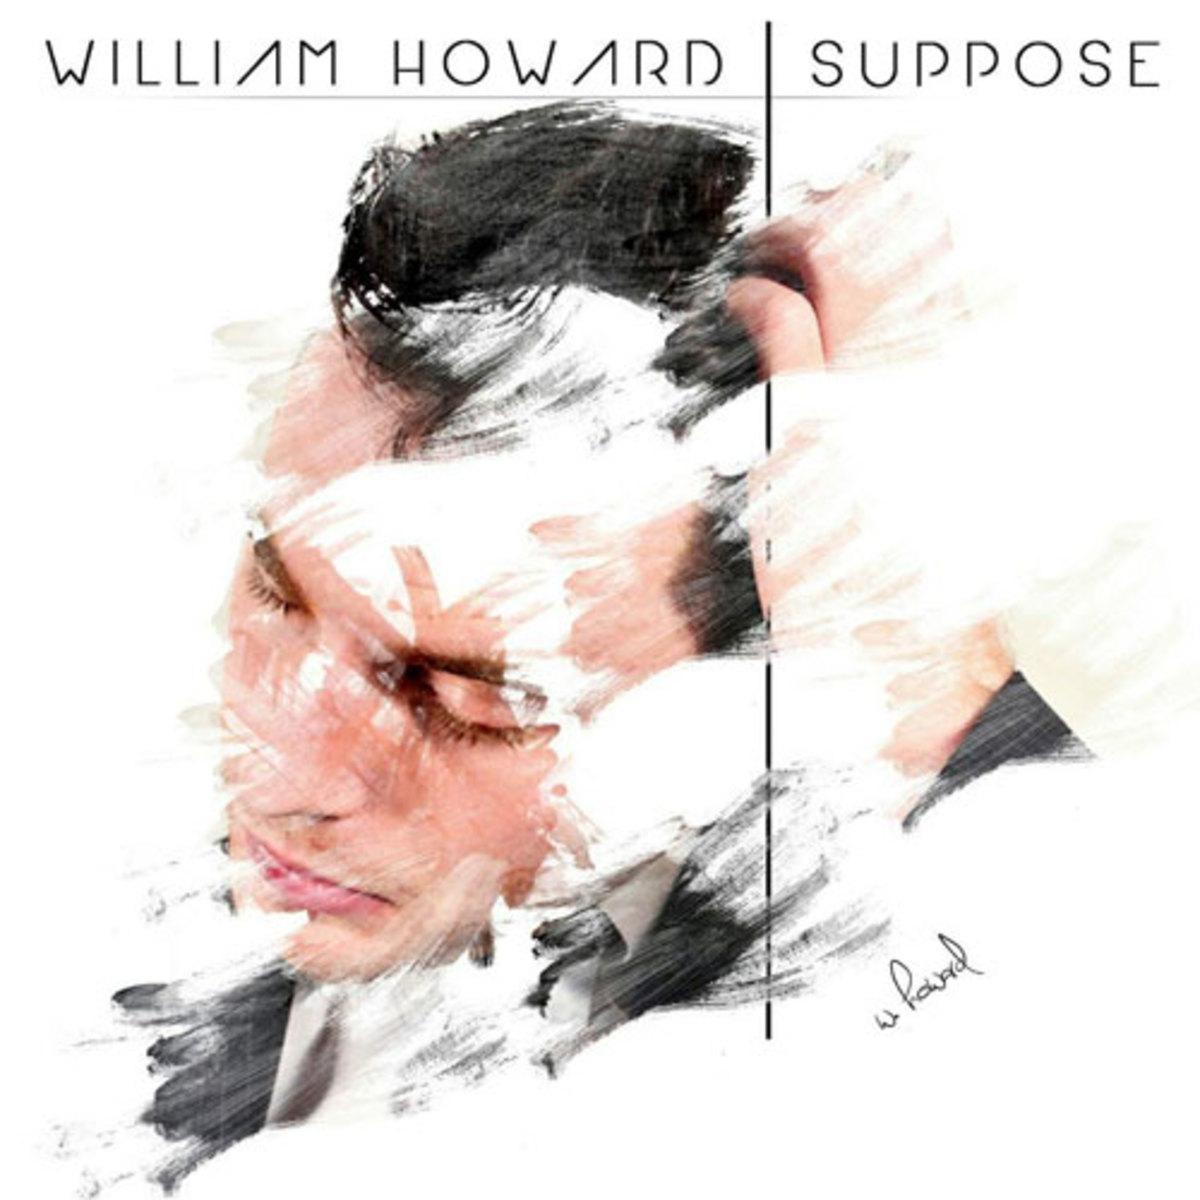 williamhoward-suppose.jpg